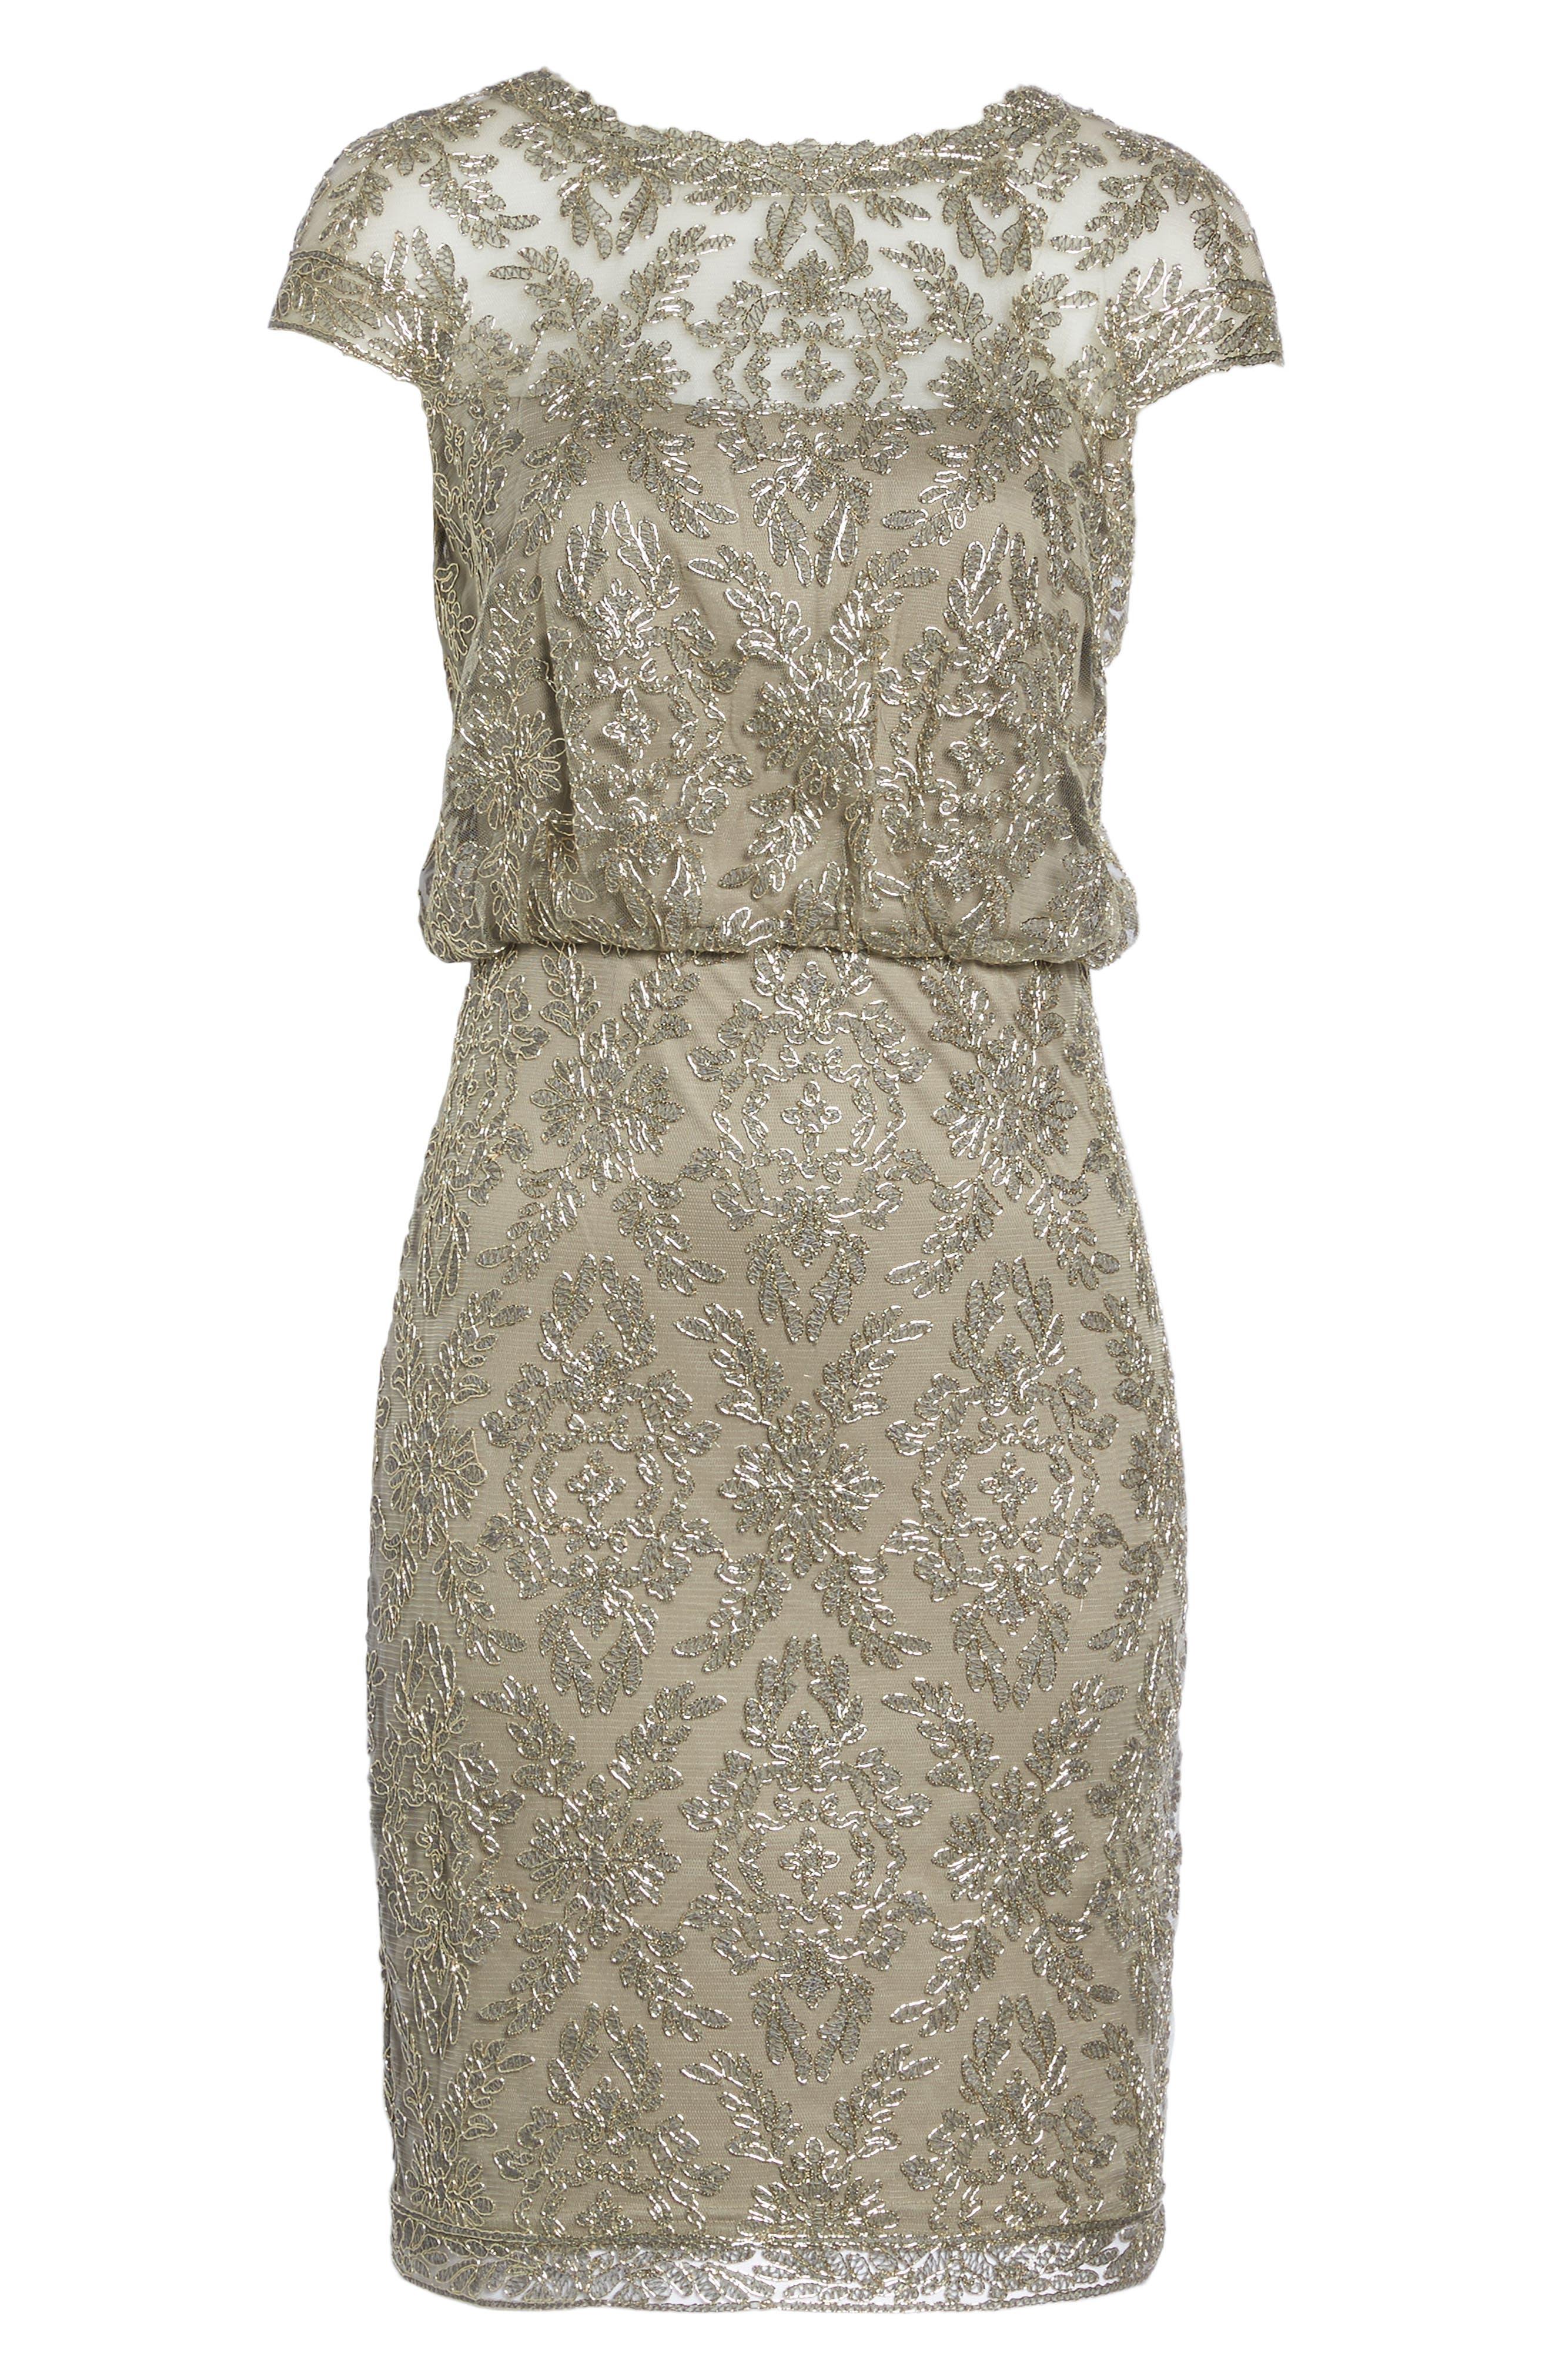 Embroidered Metallic Blouson Dress,                             Alternate thumbnail 6, color,                             Smoke Pearl